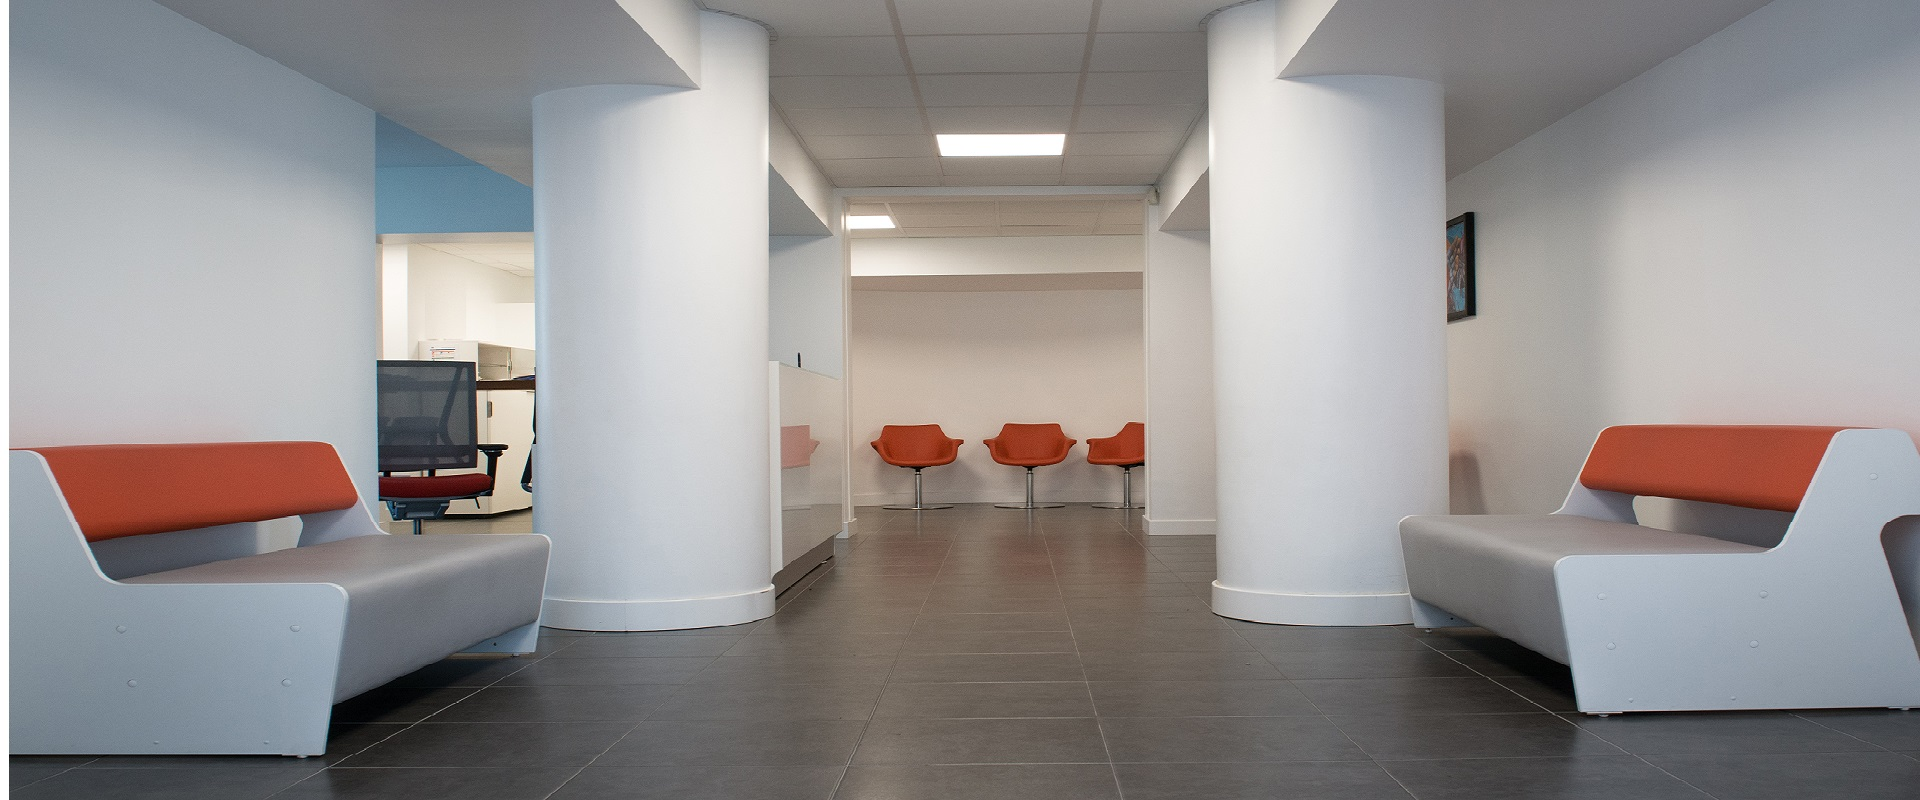 Centres Ophtalmologiques Foch